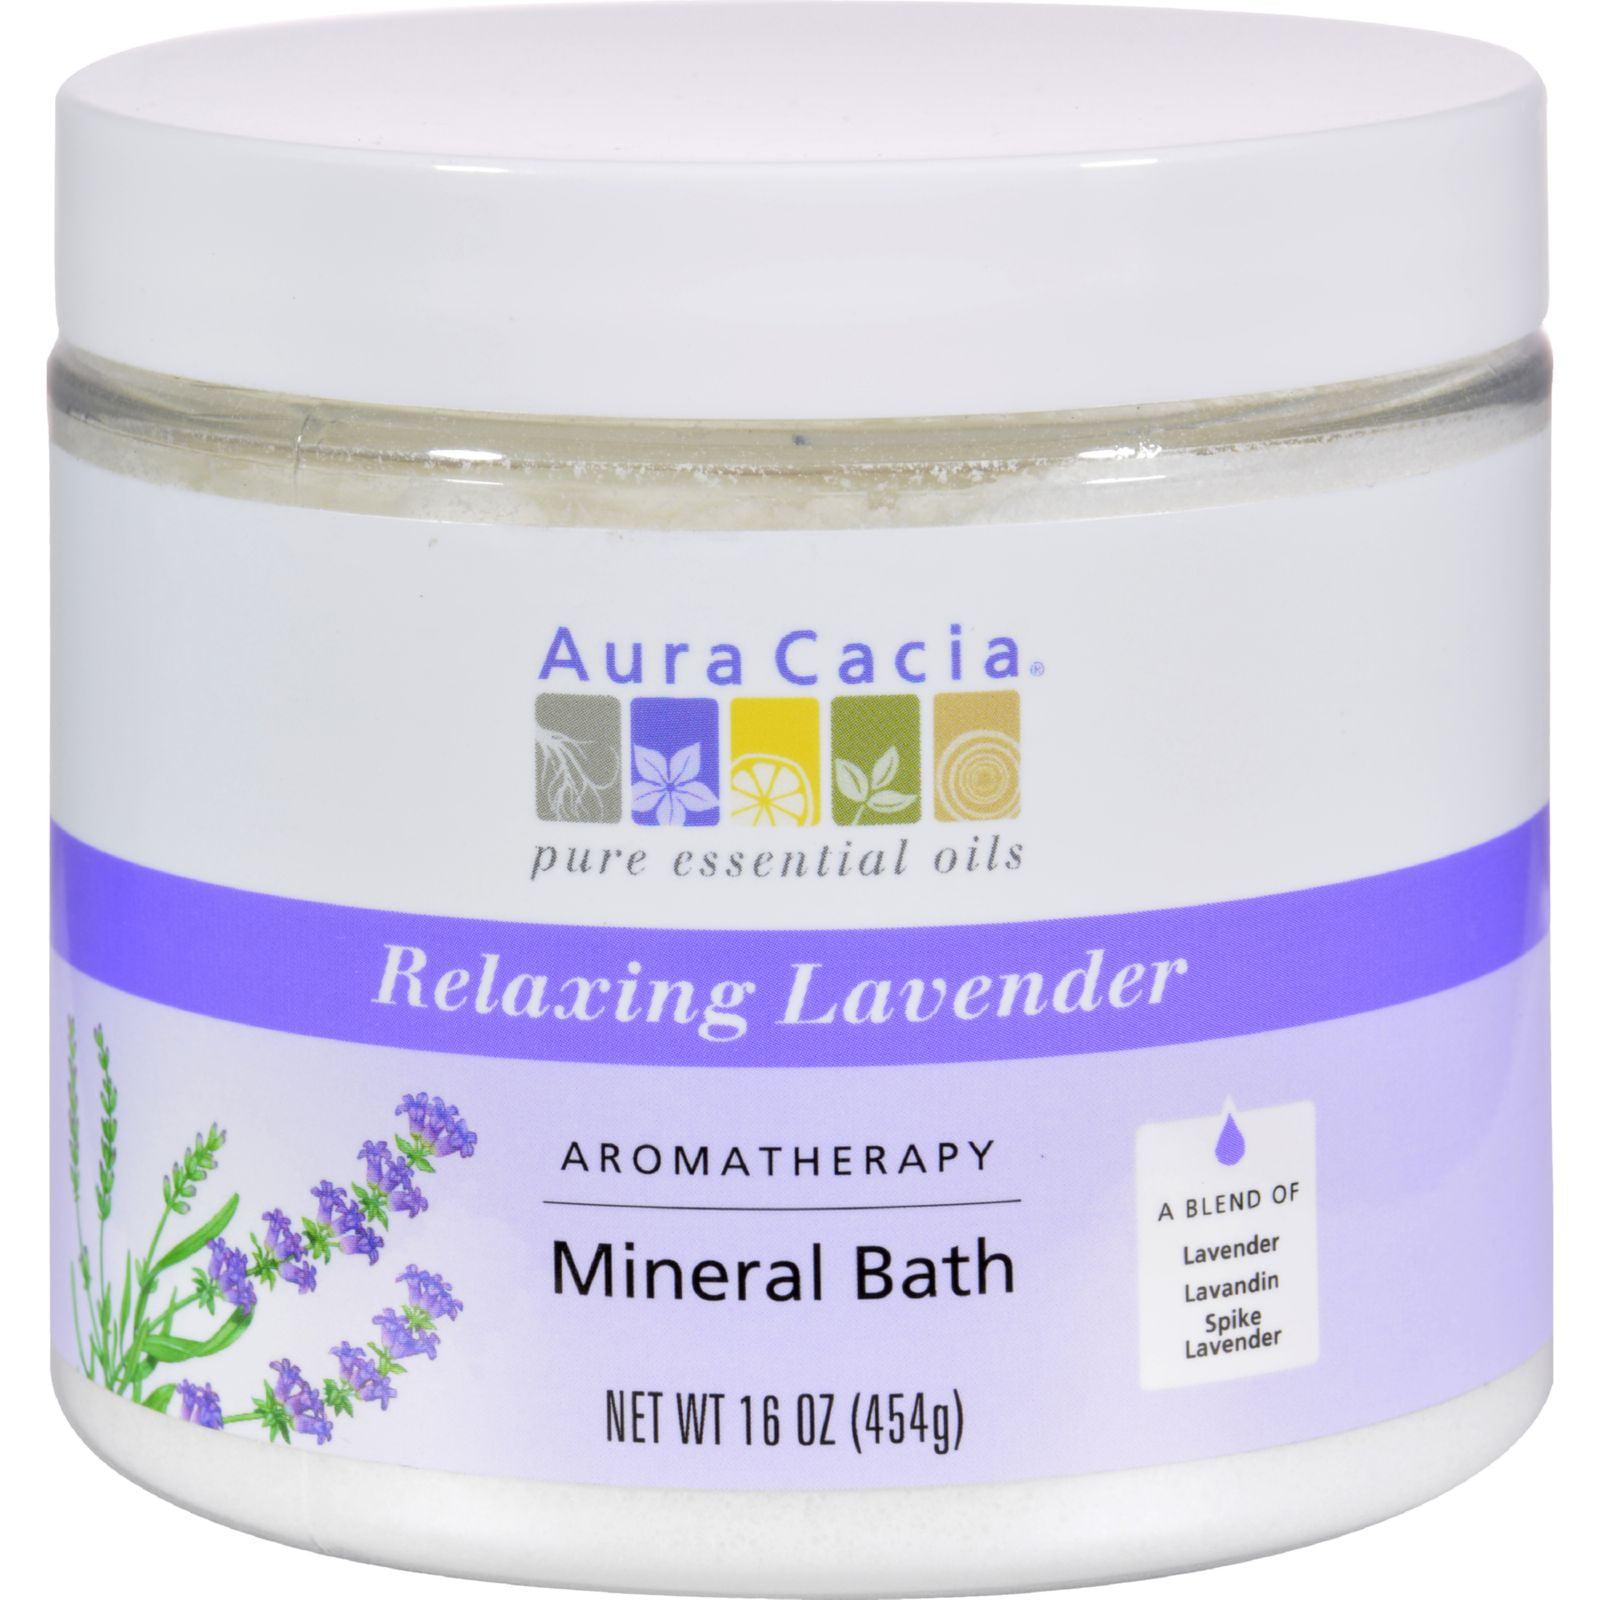 Aura Cacia Aromatherapy Mineral Bath Lavender Harvest - 16 oz